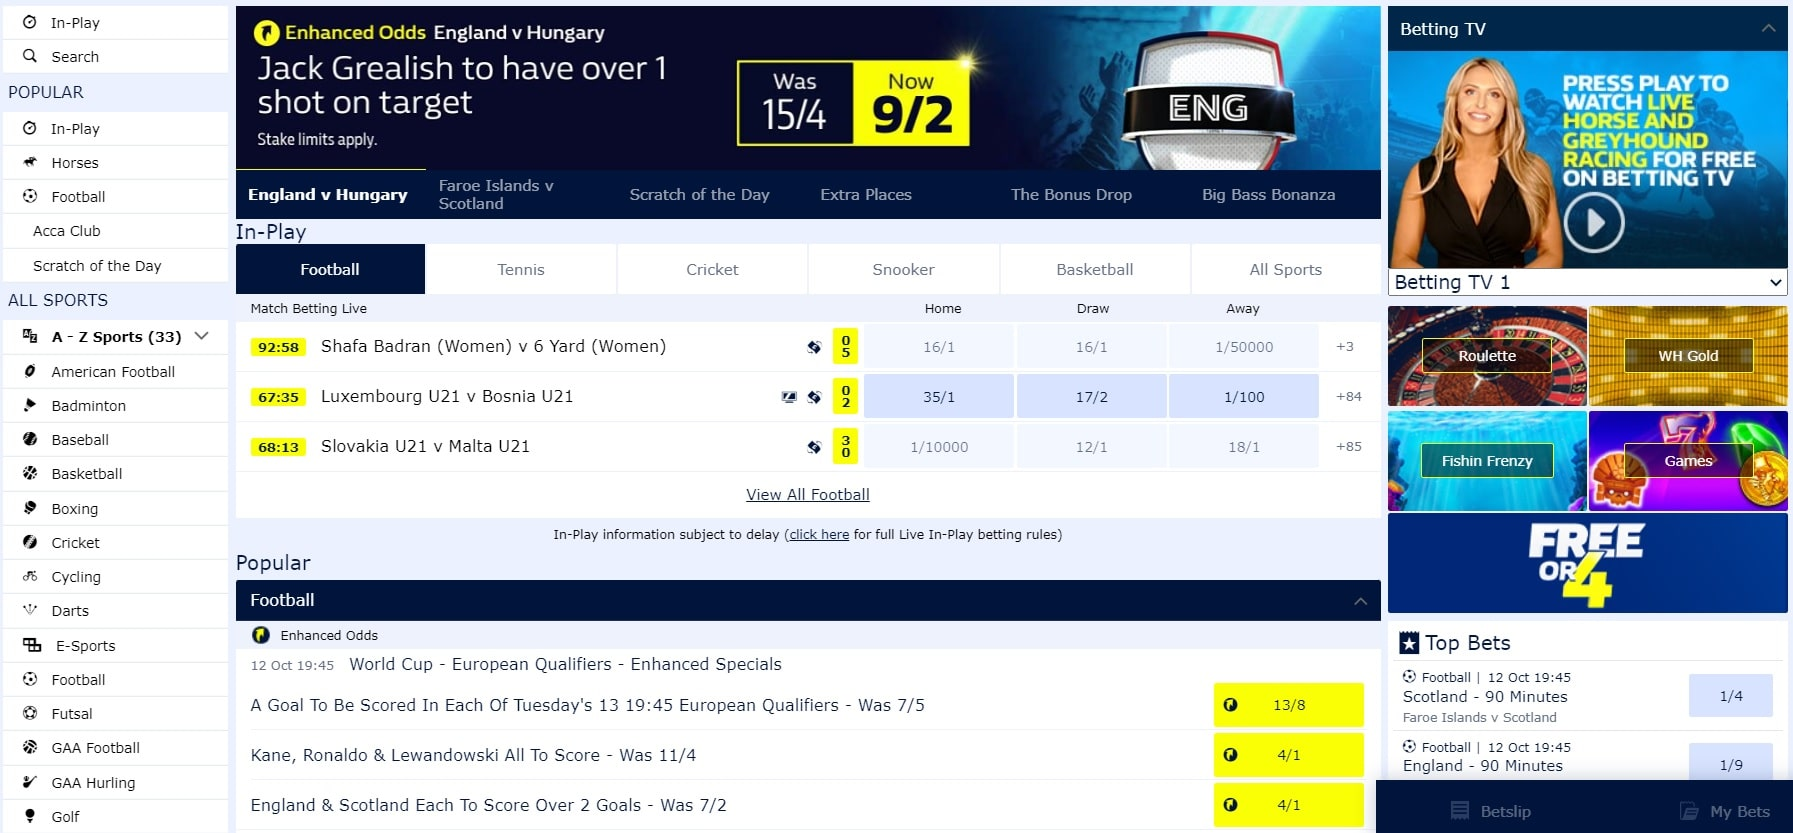 William Hill enhanced odds